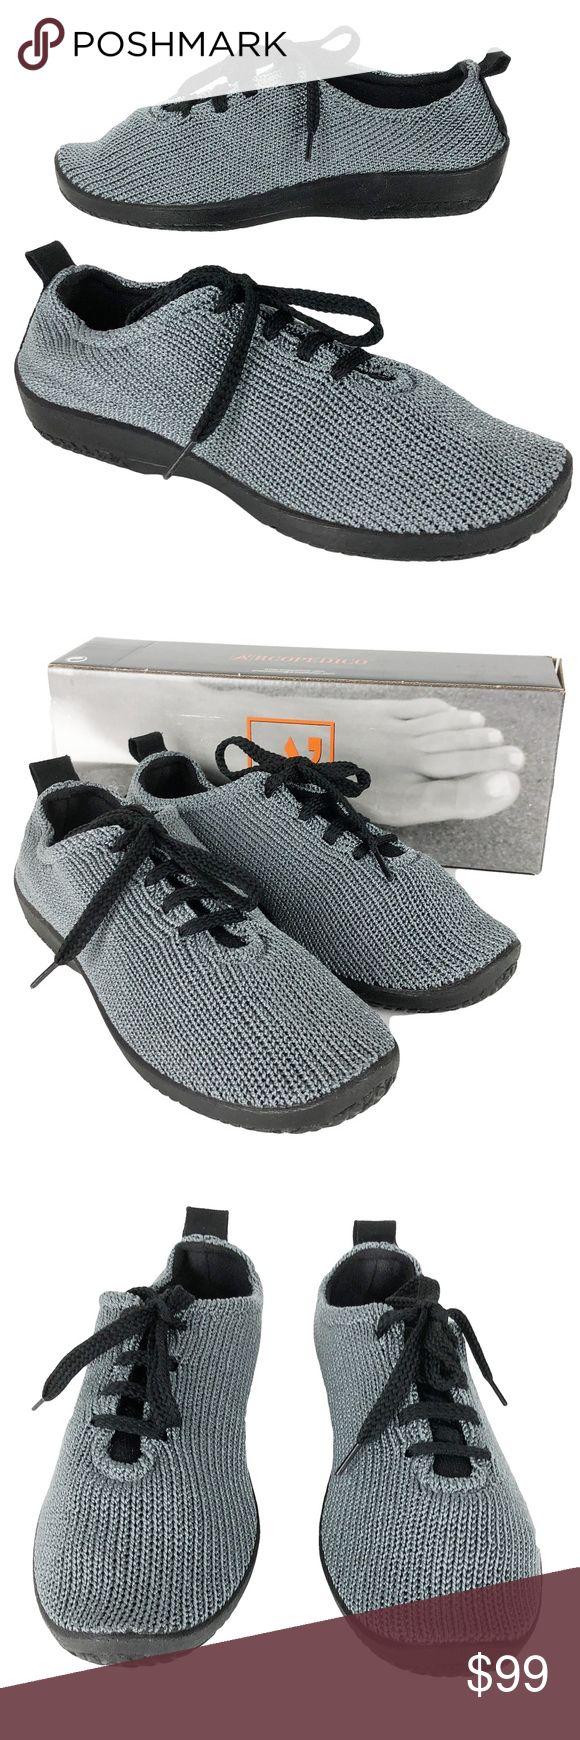 Arcopedico 6.5/37 Titanium LS 1151 Womens Fabric Arcopedico  Size 37/6.5 (according to the Arcopedico shoe size chart) LS 1151  Titanium Fabric Comfort Shoes  New In Box 807883276788 No Trades Arcopedico Shoes Flats & Loafers